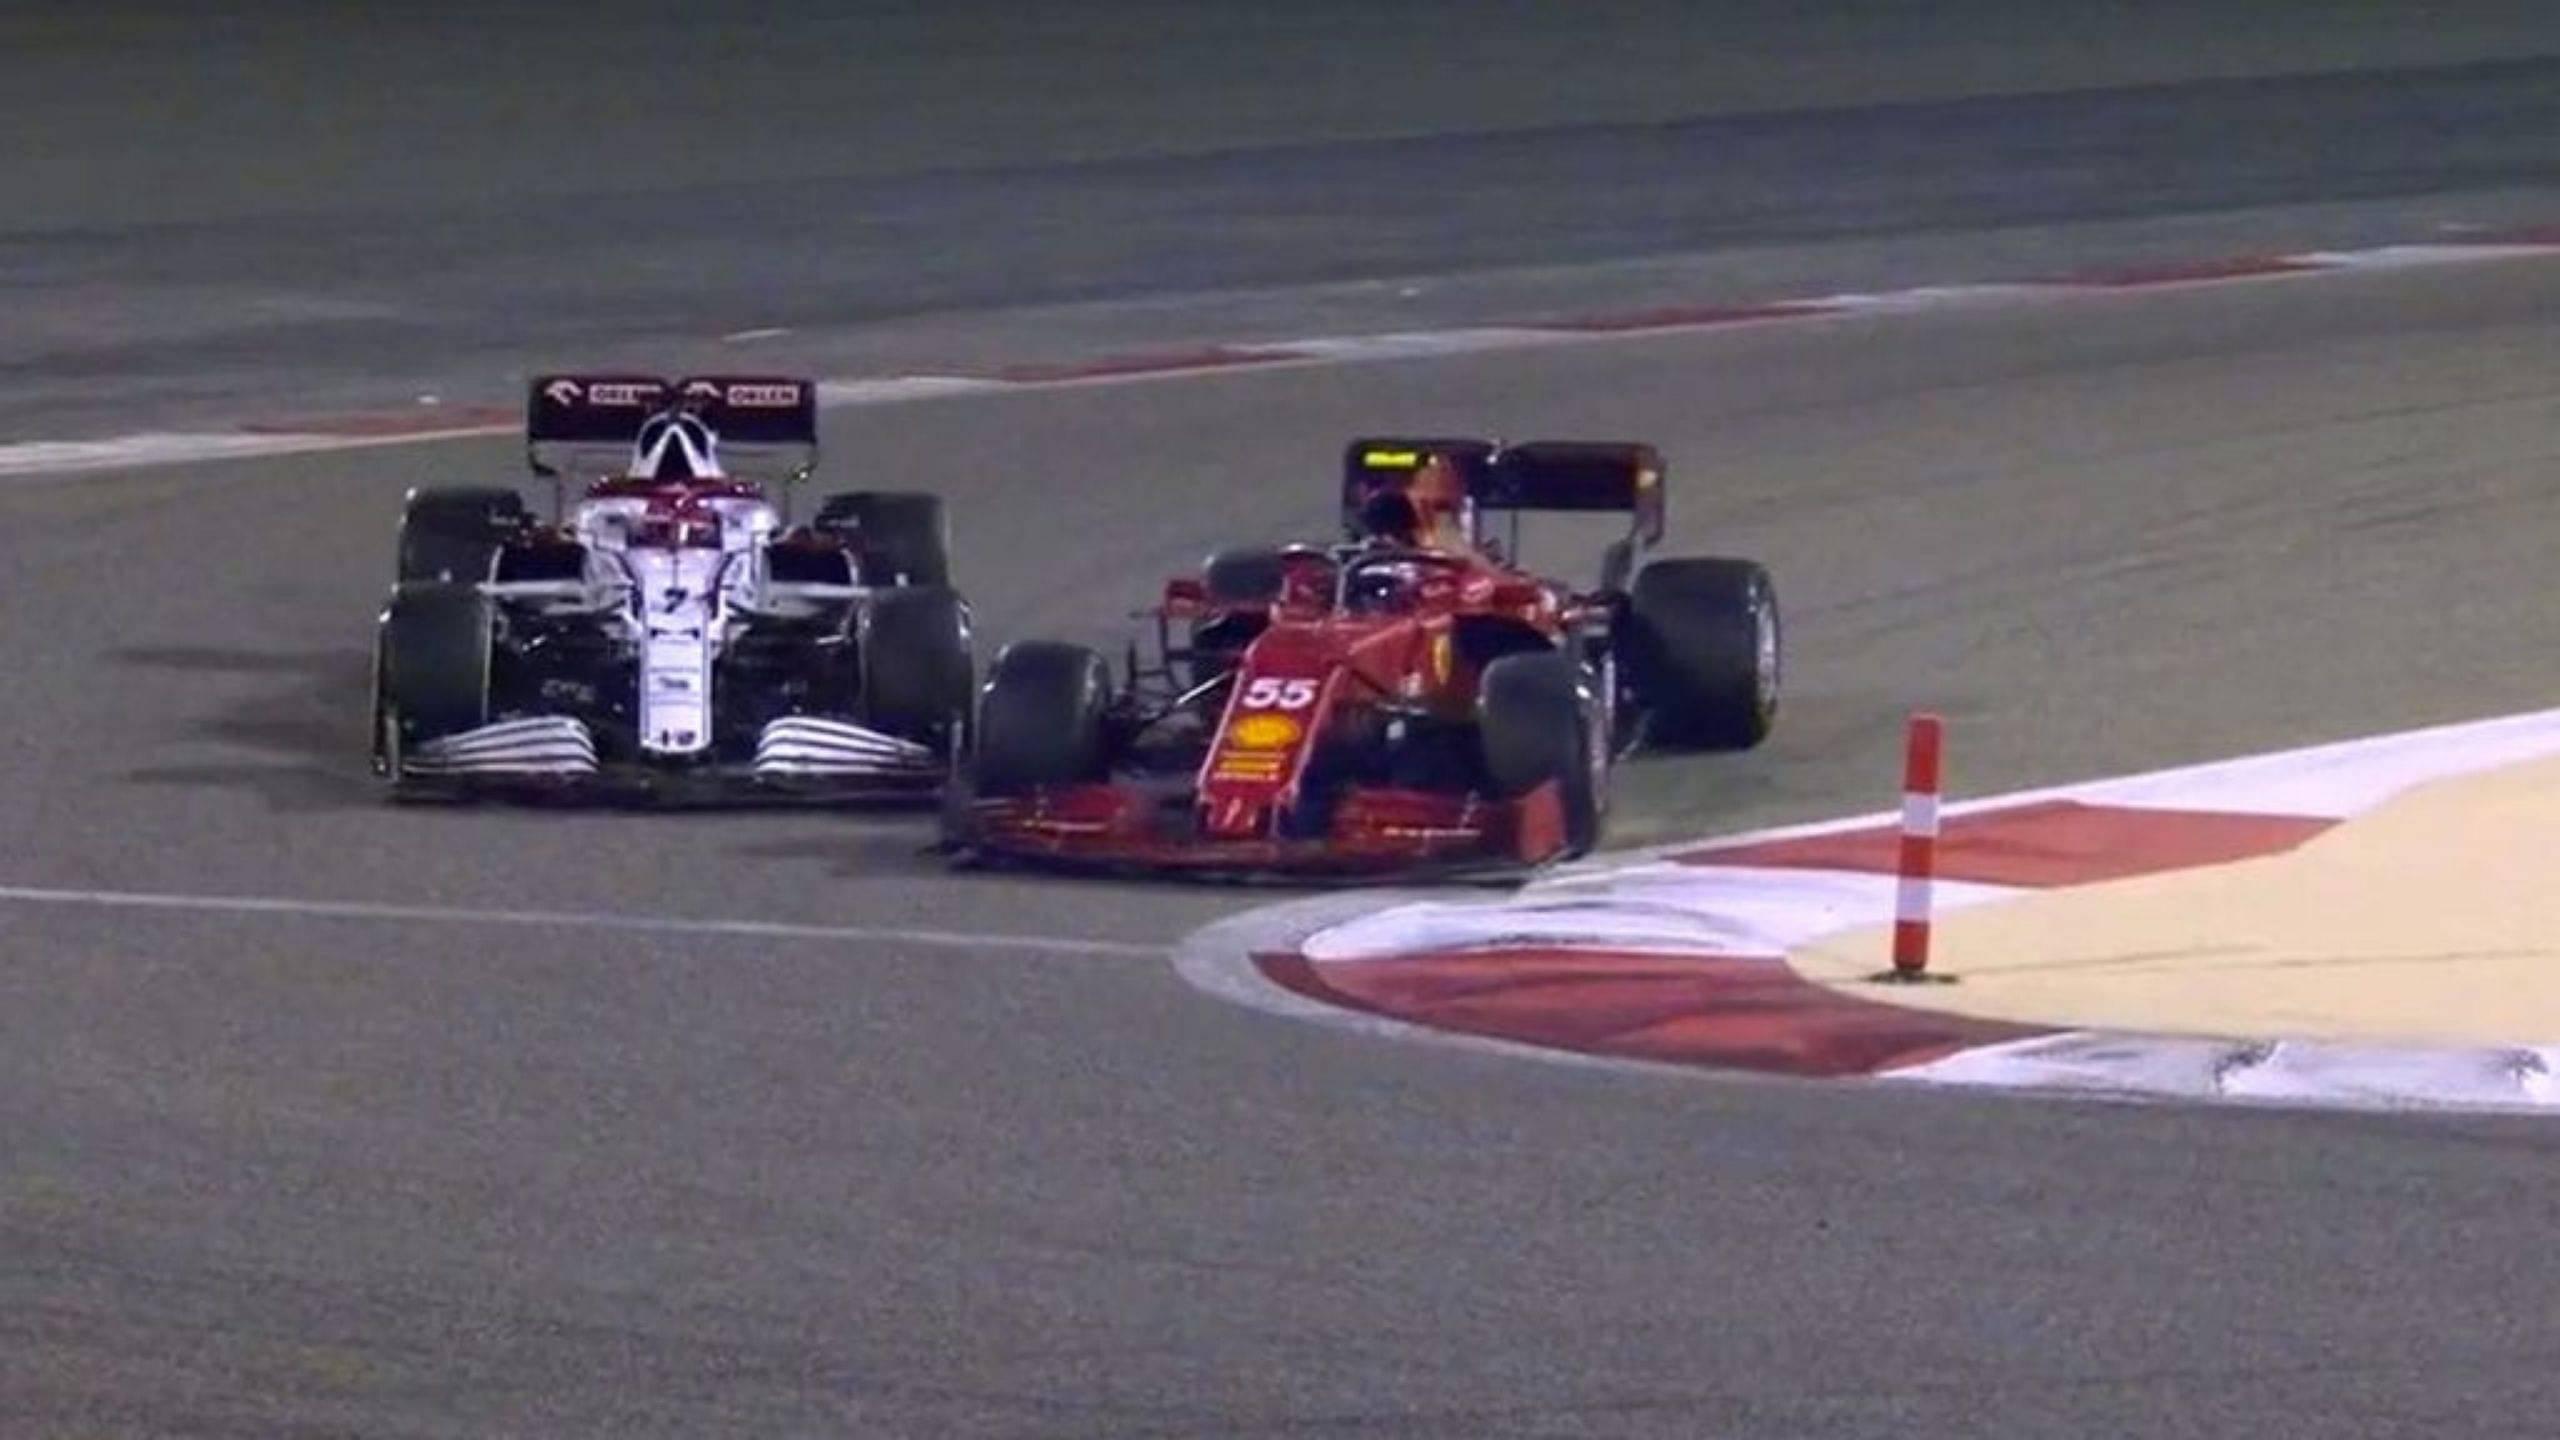 WATCH: Carlos Sainz collides into Kimi Raikkonen during Day 3 of pre-season testing in Bahrain